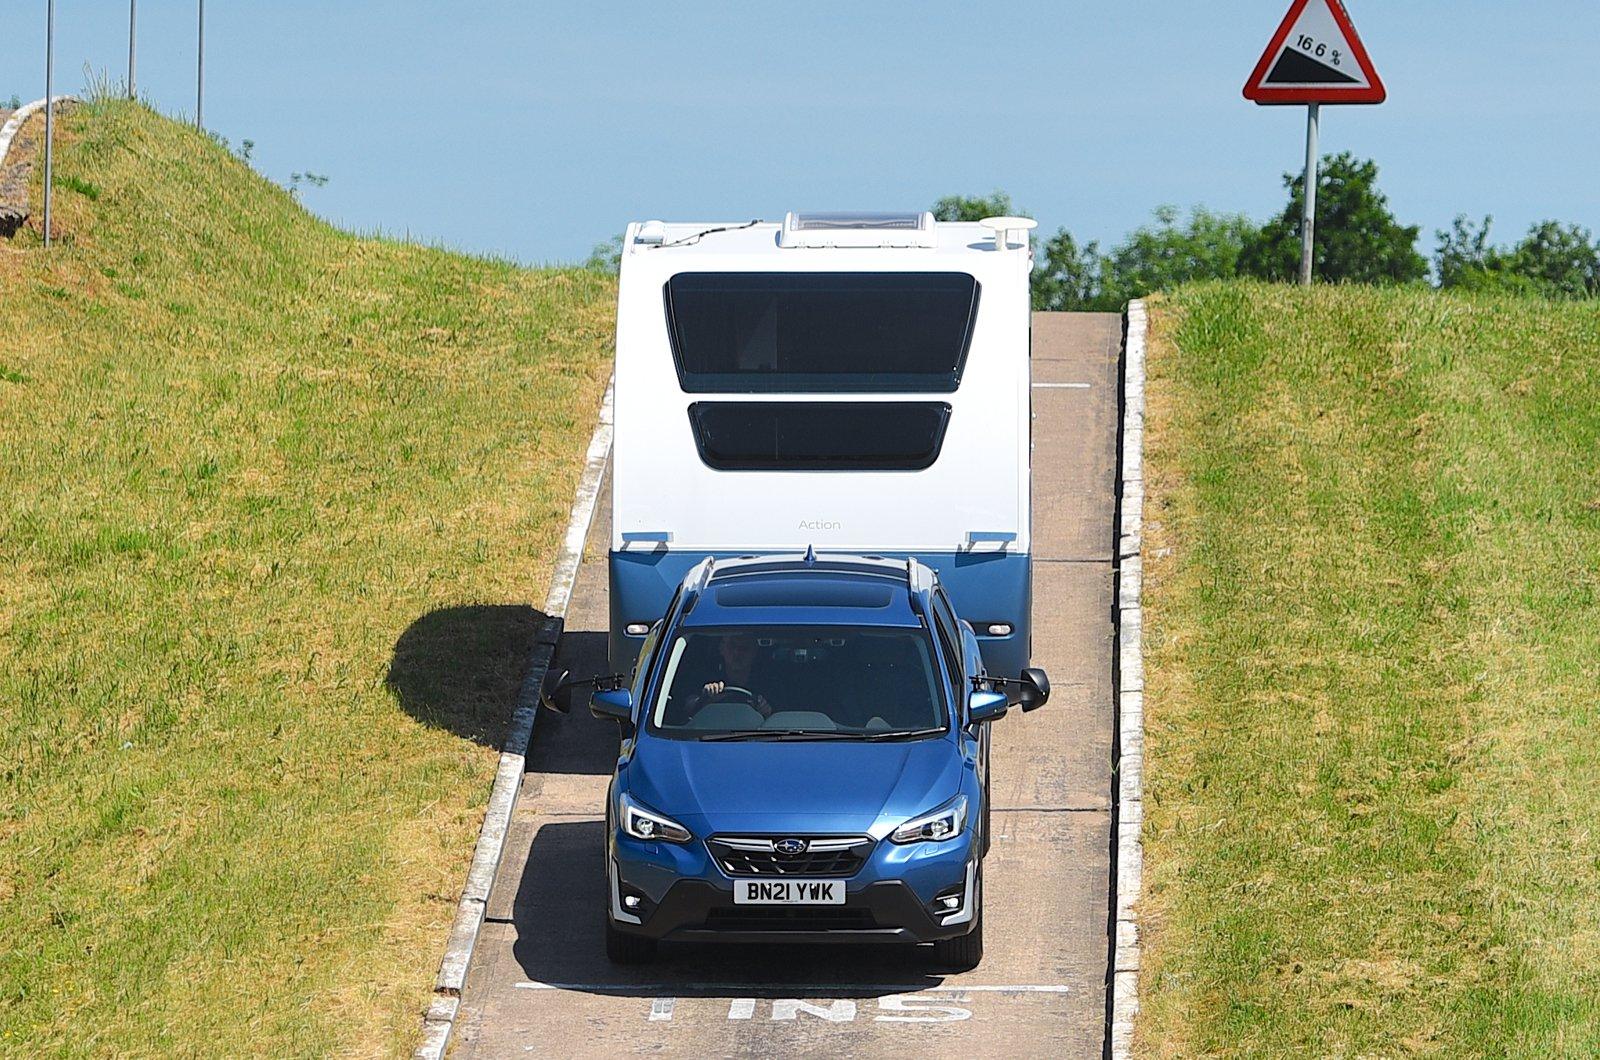 Subaru Forester pulling a caravan